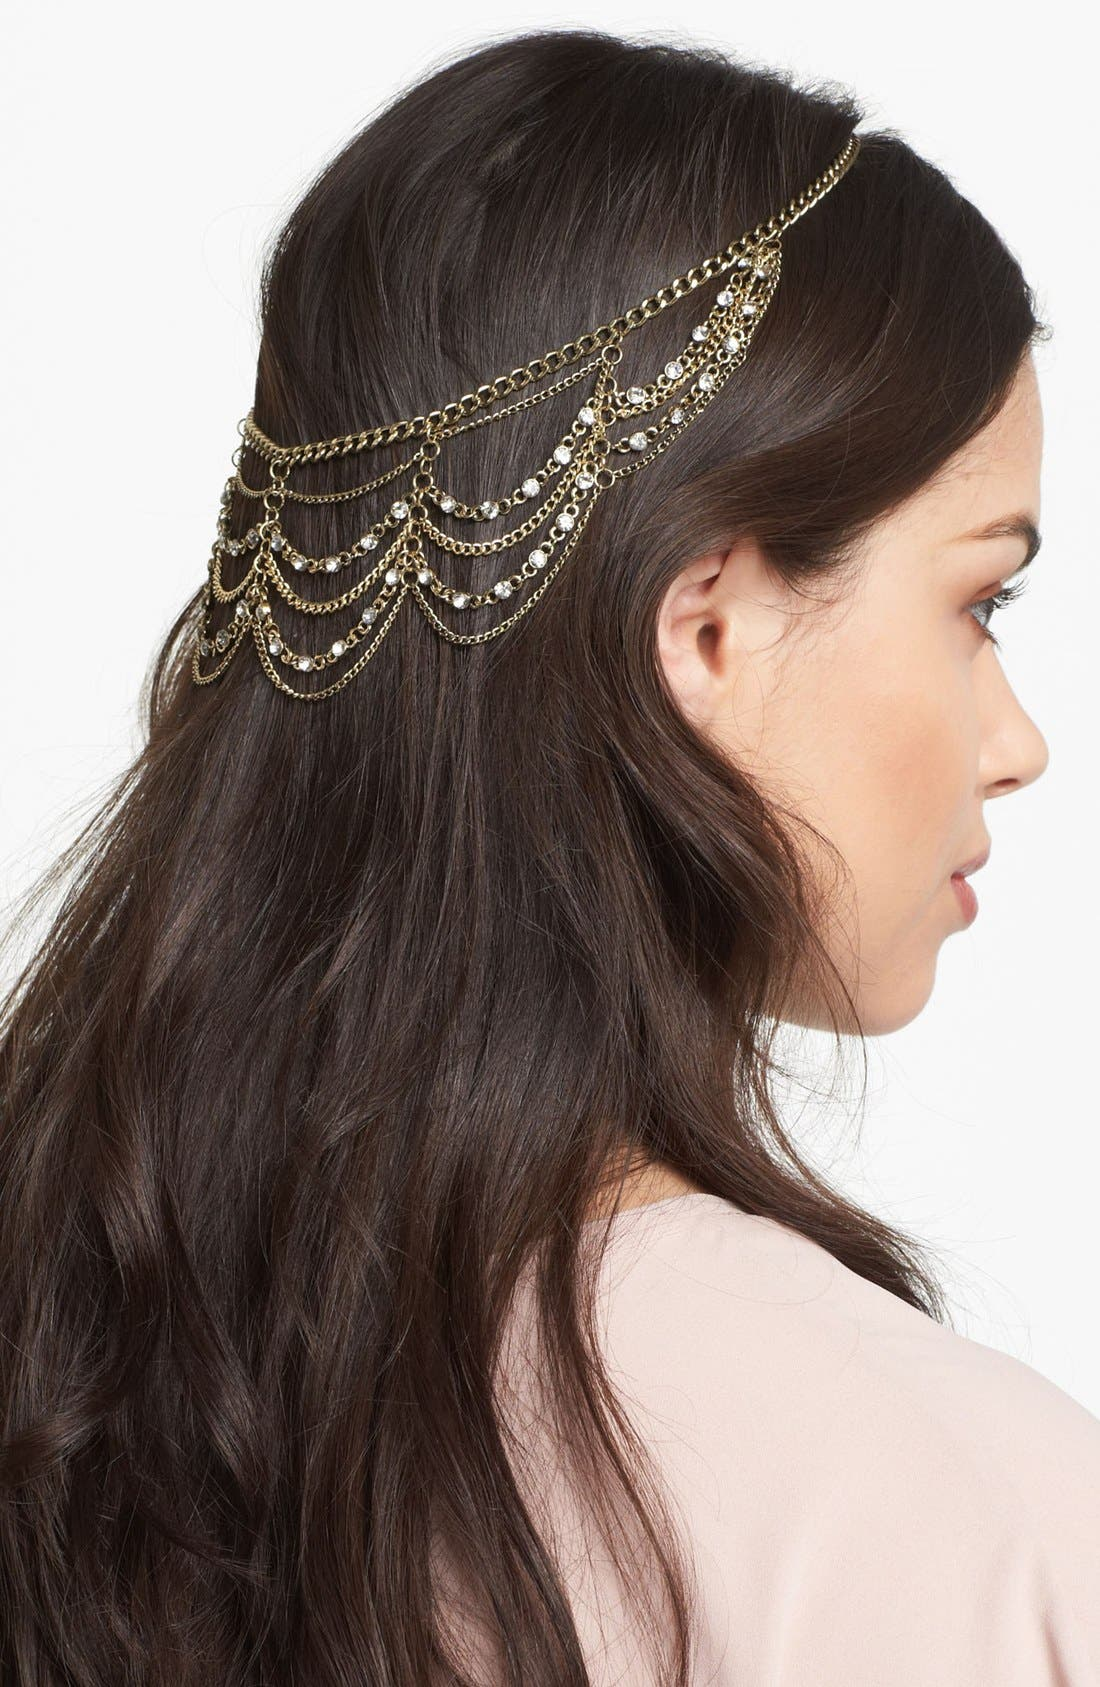 Main Image - Orion 'Empress' Chain Head Wrap